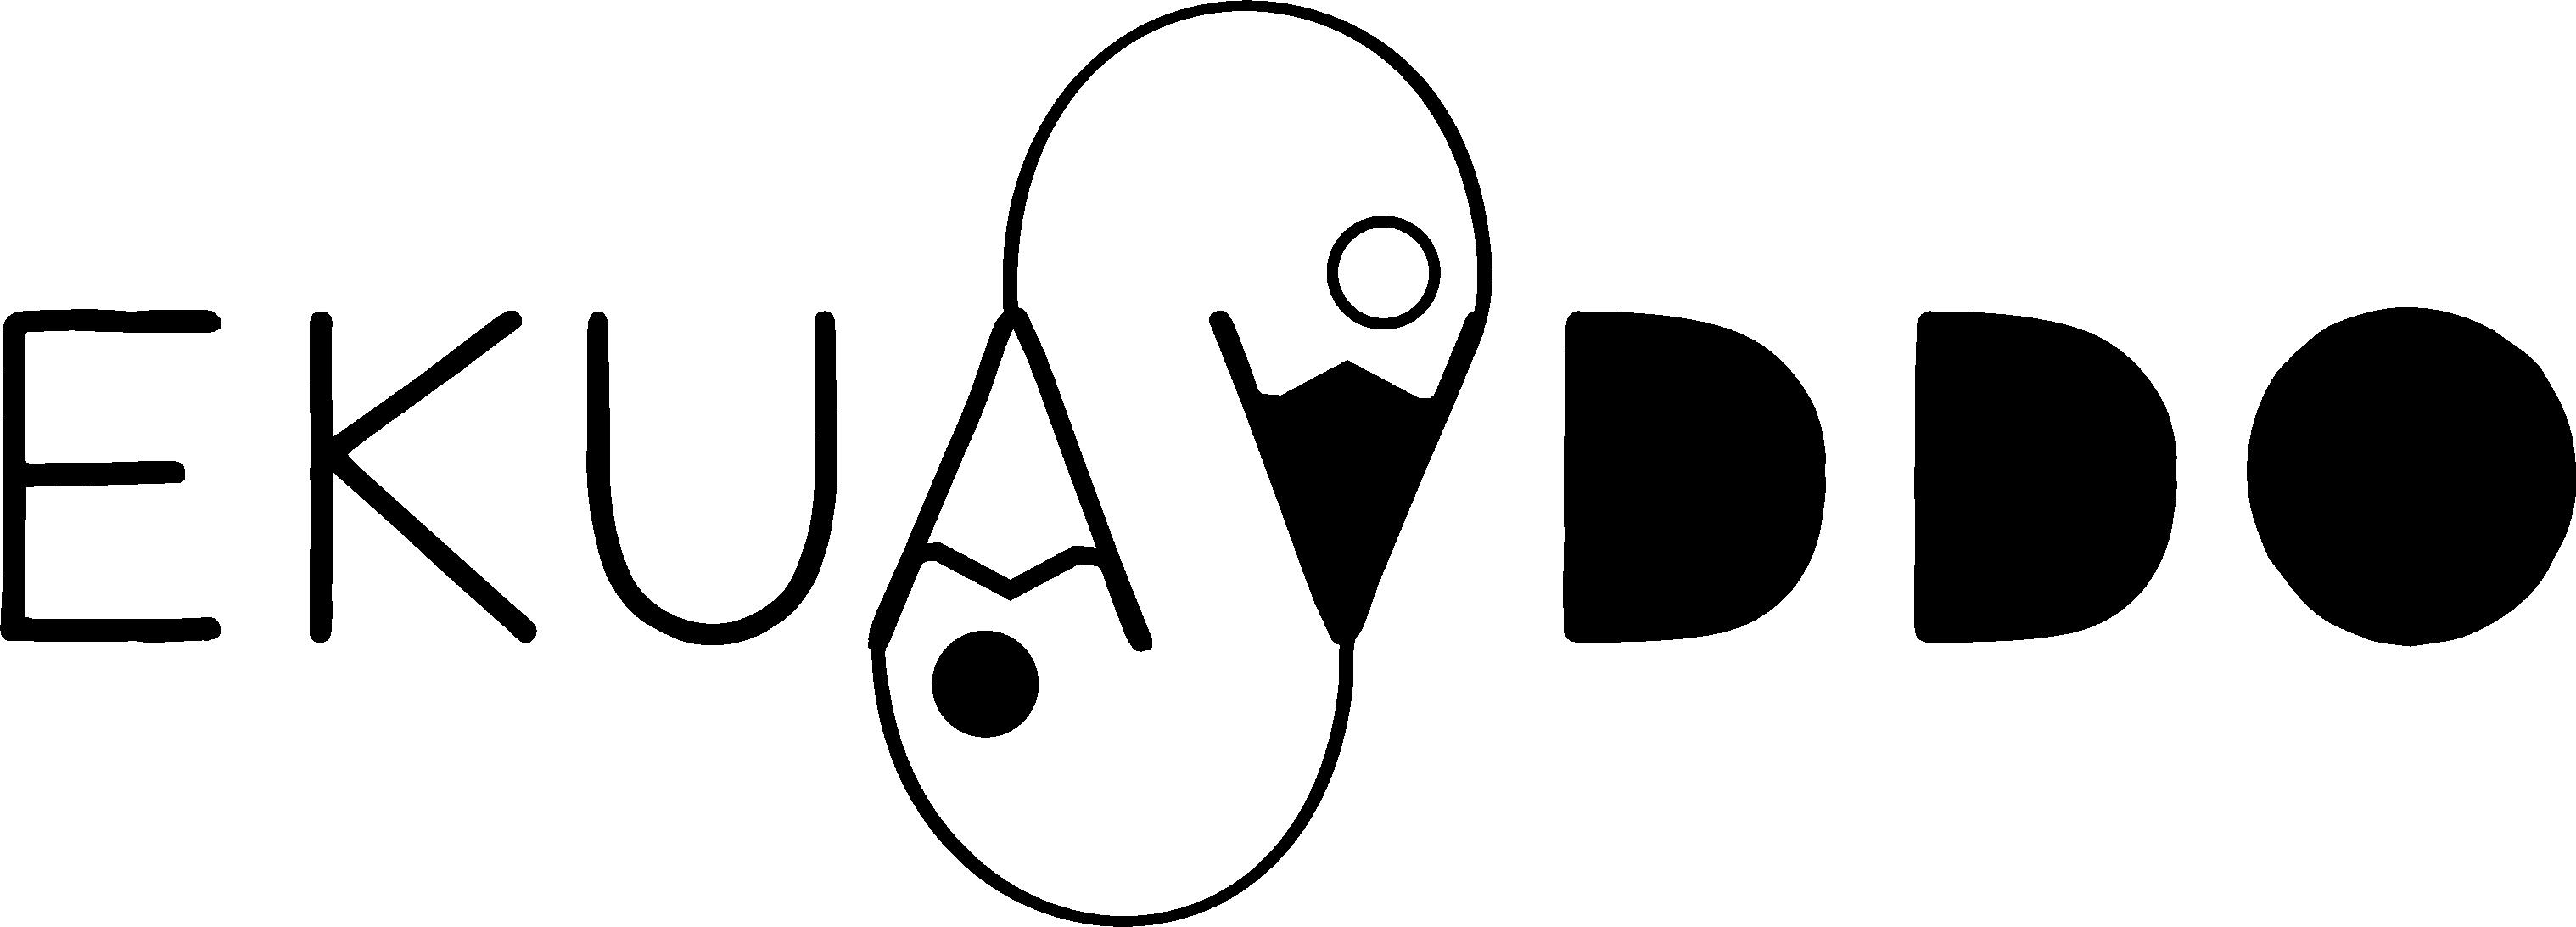 Ekuaado